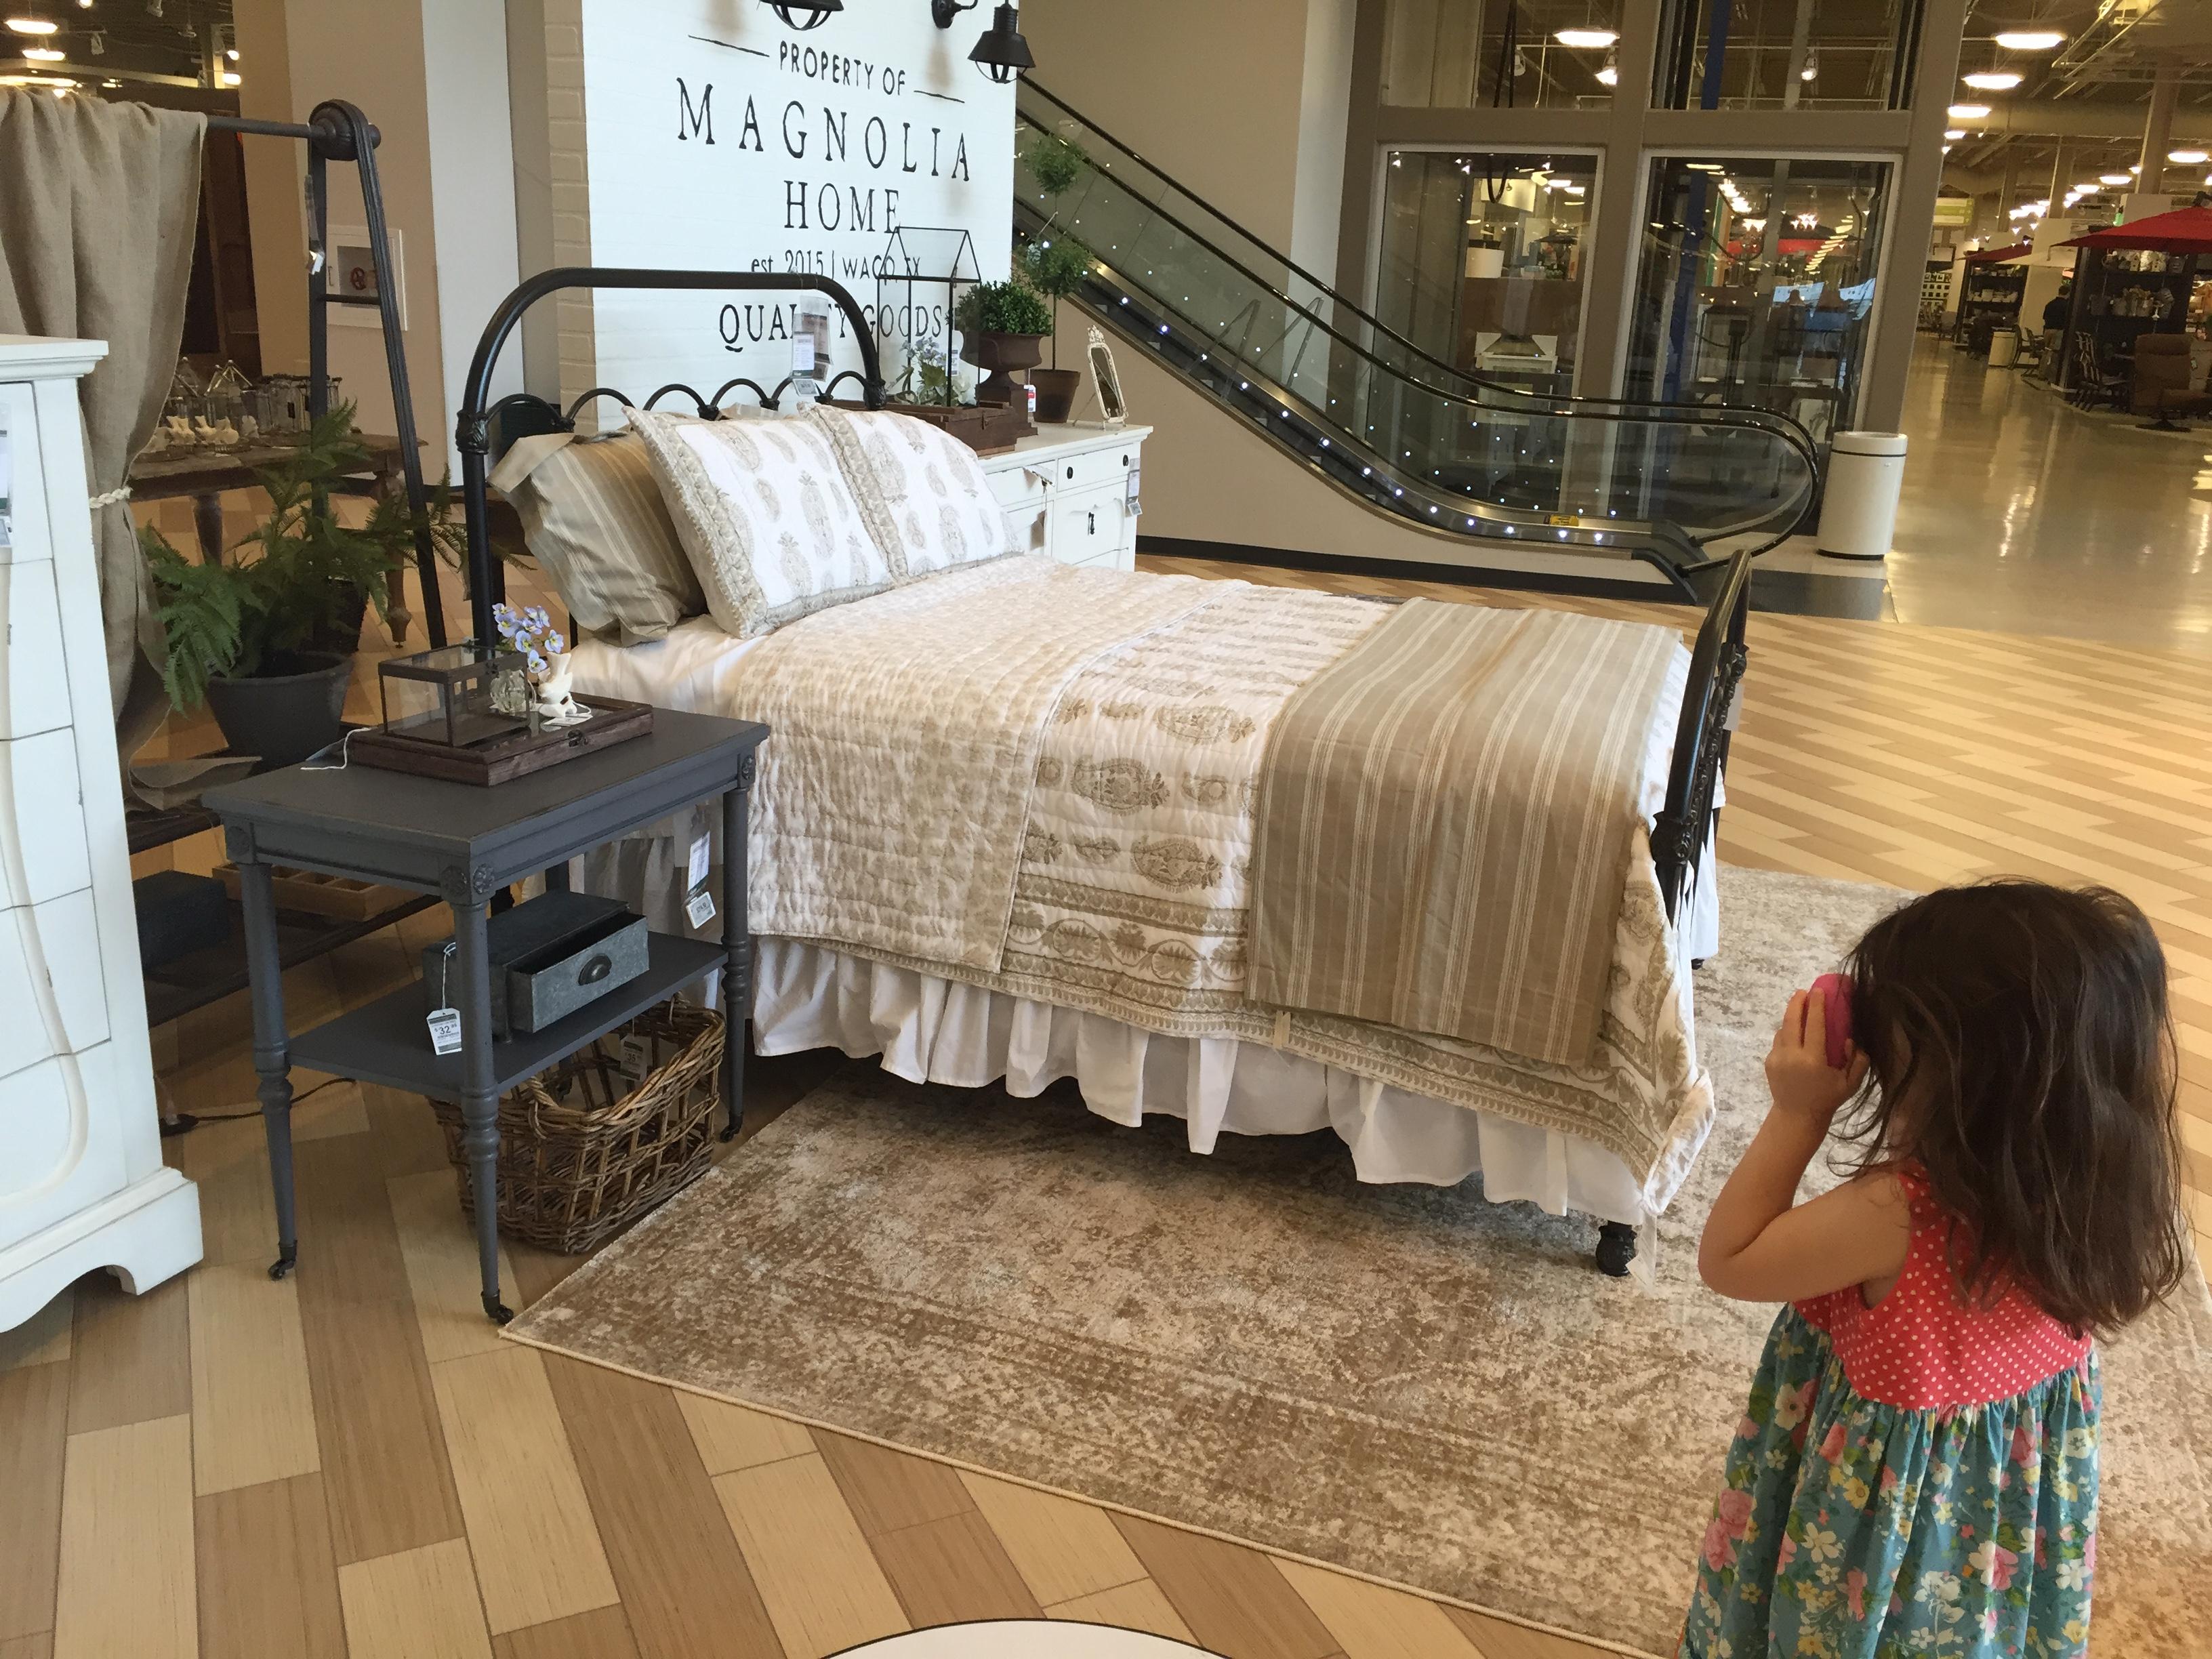 Magnolia Home (6)